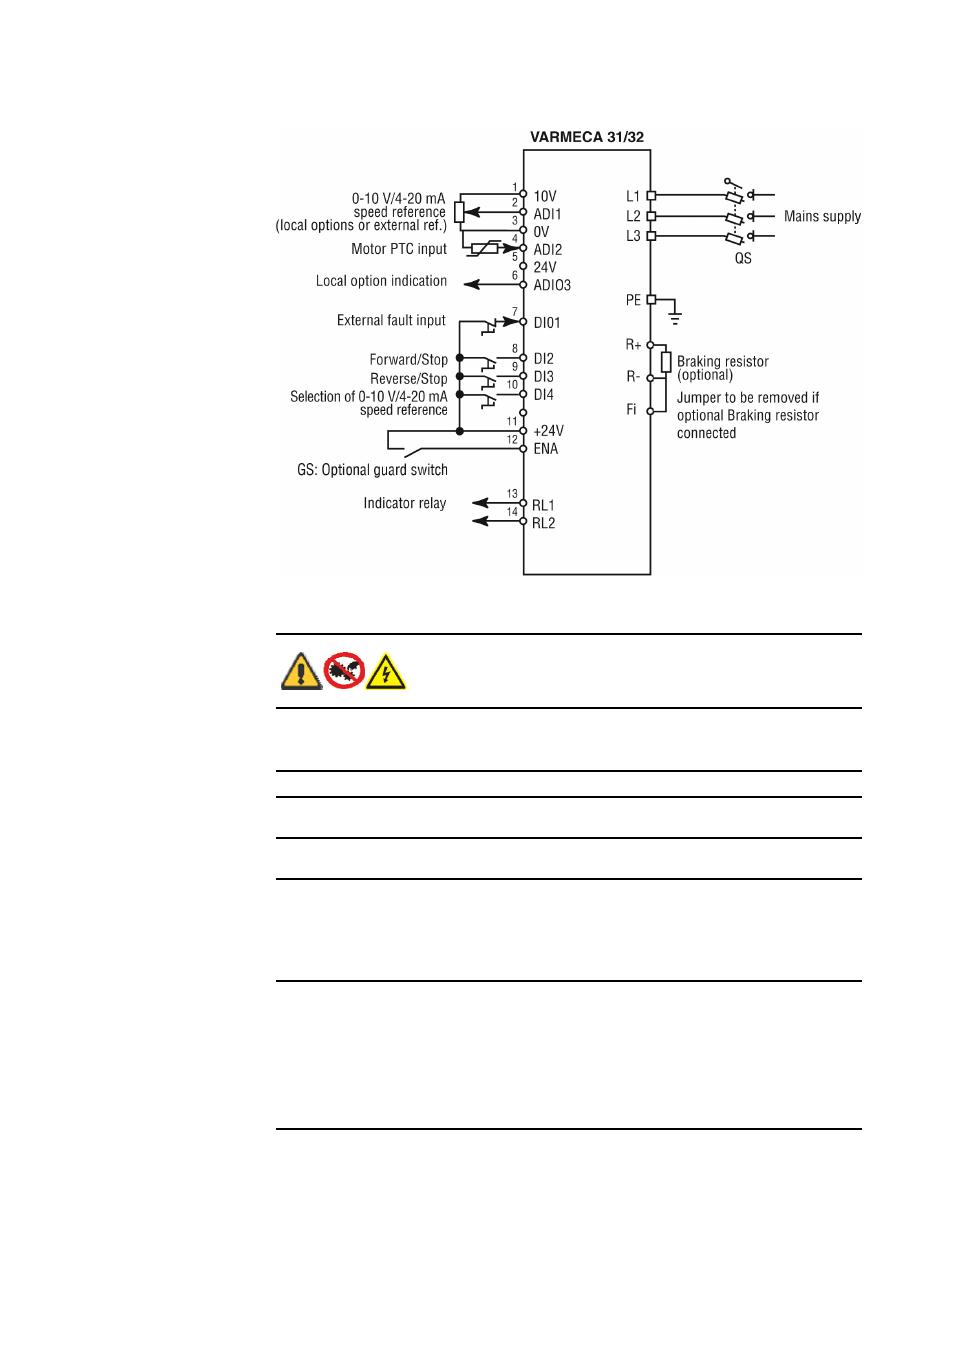 medium resolution of 5 varmeca drives three phase connection diagram 6 varmeca drives keypad indicator light display watson marlow 621cc user manual